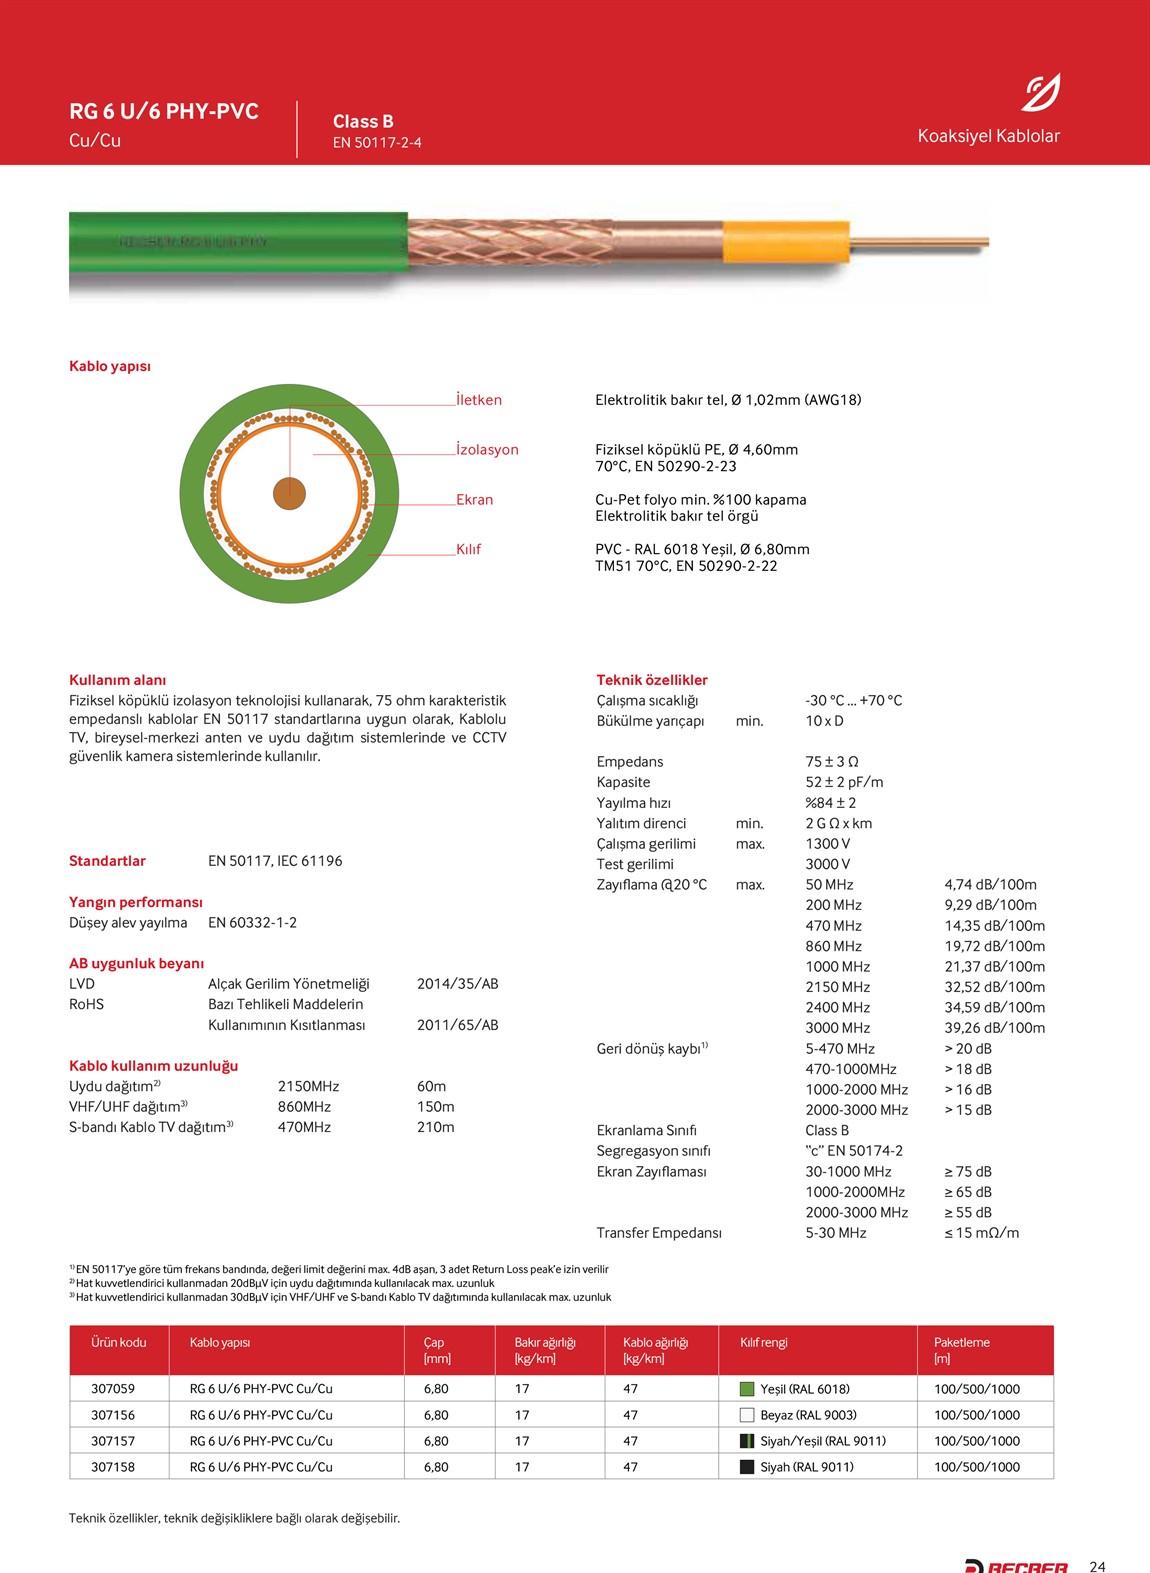 REÇBER RG6 U6 PHY-PVC Cu/Cu Kablo - Yeşil 100 Metre